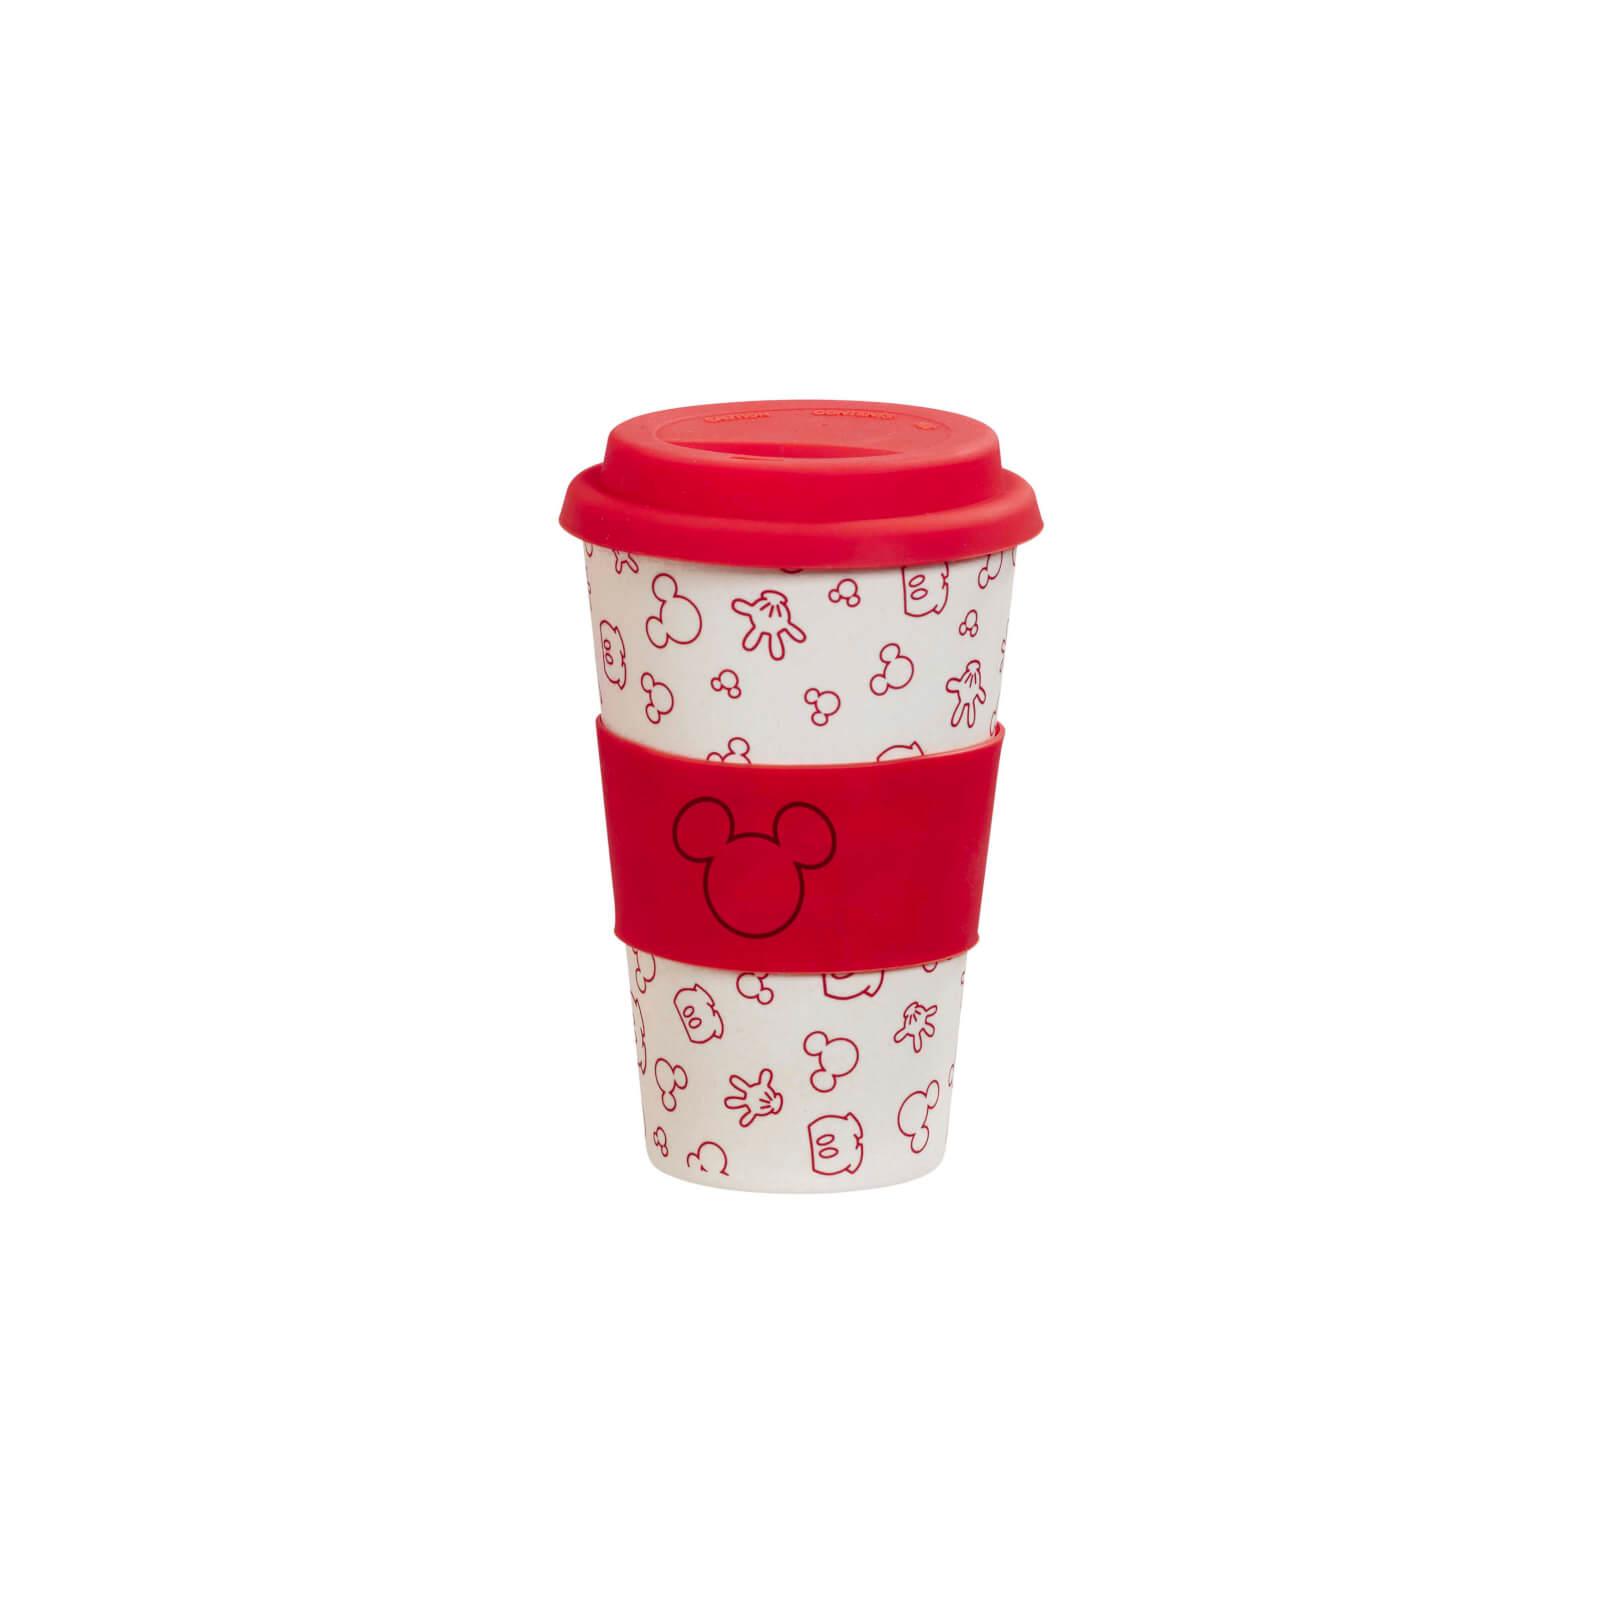 Image of Funko Homeware Disney Colour Block Oh Boy Bamboo Lidded Mug